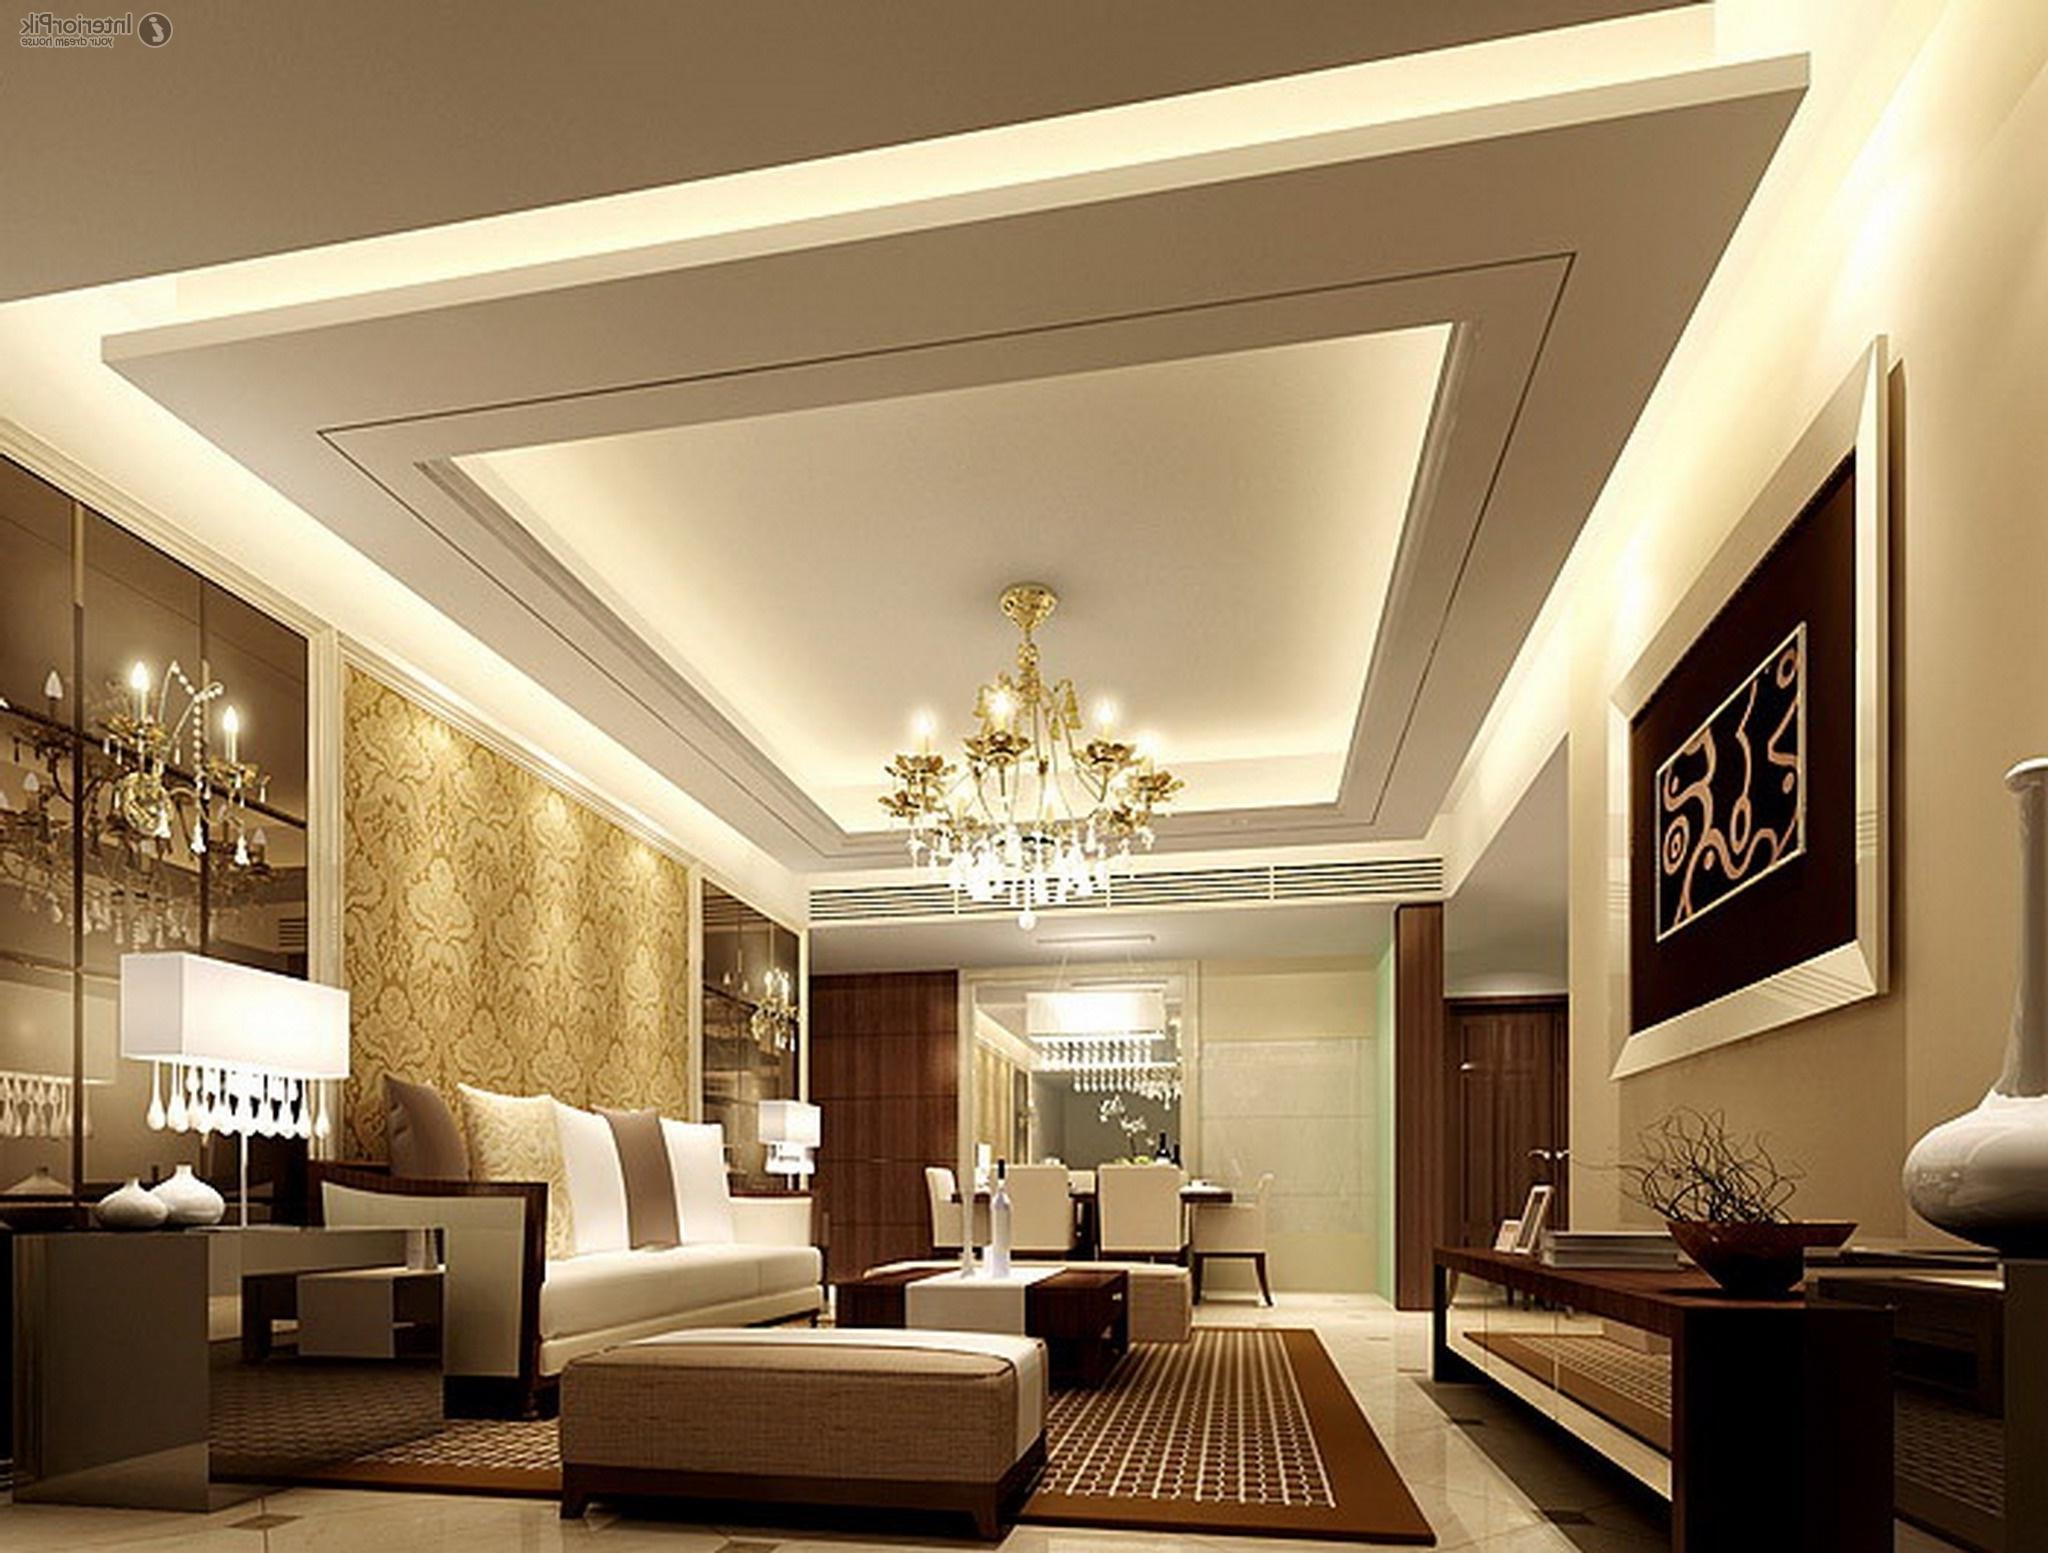 Gypsum Ceiling Design For Living Room Gypsum Ceiling For